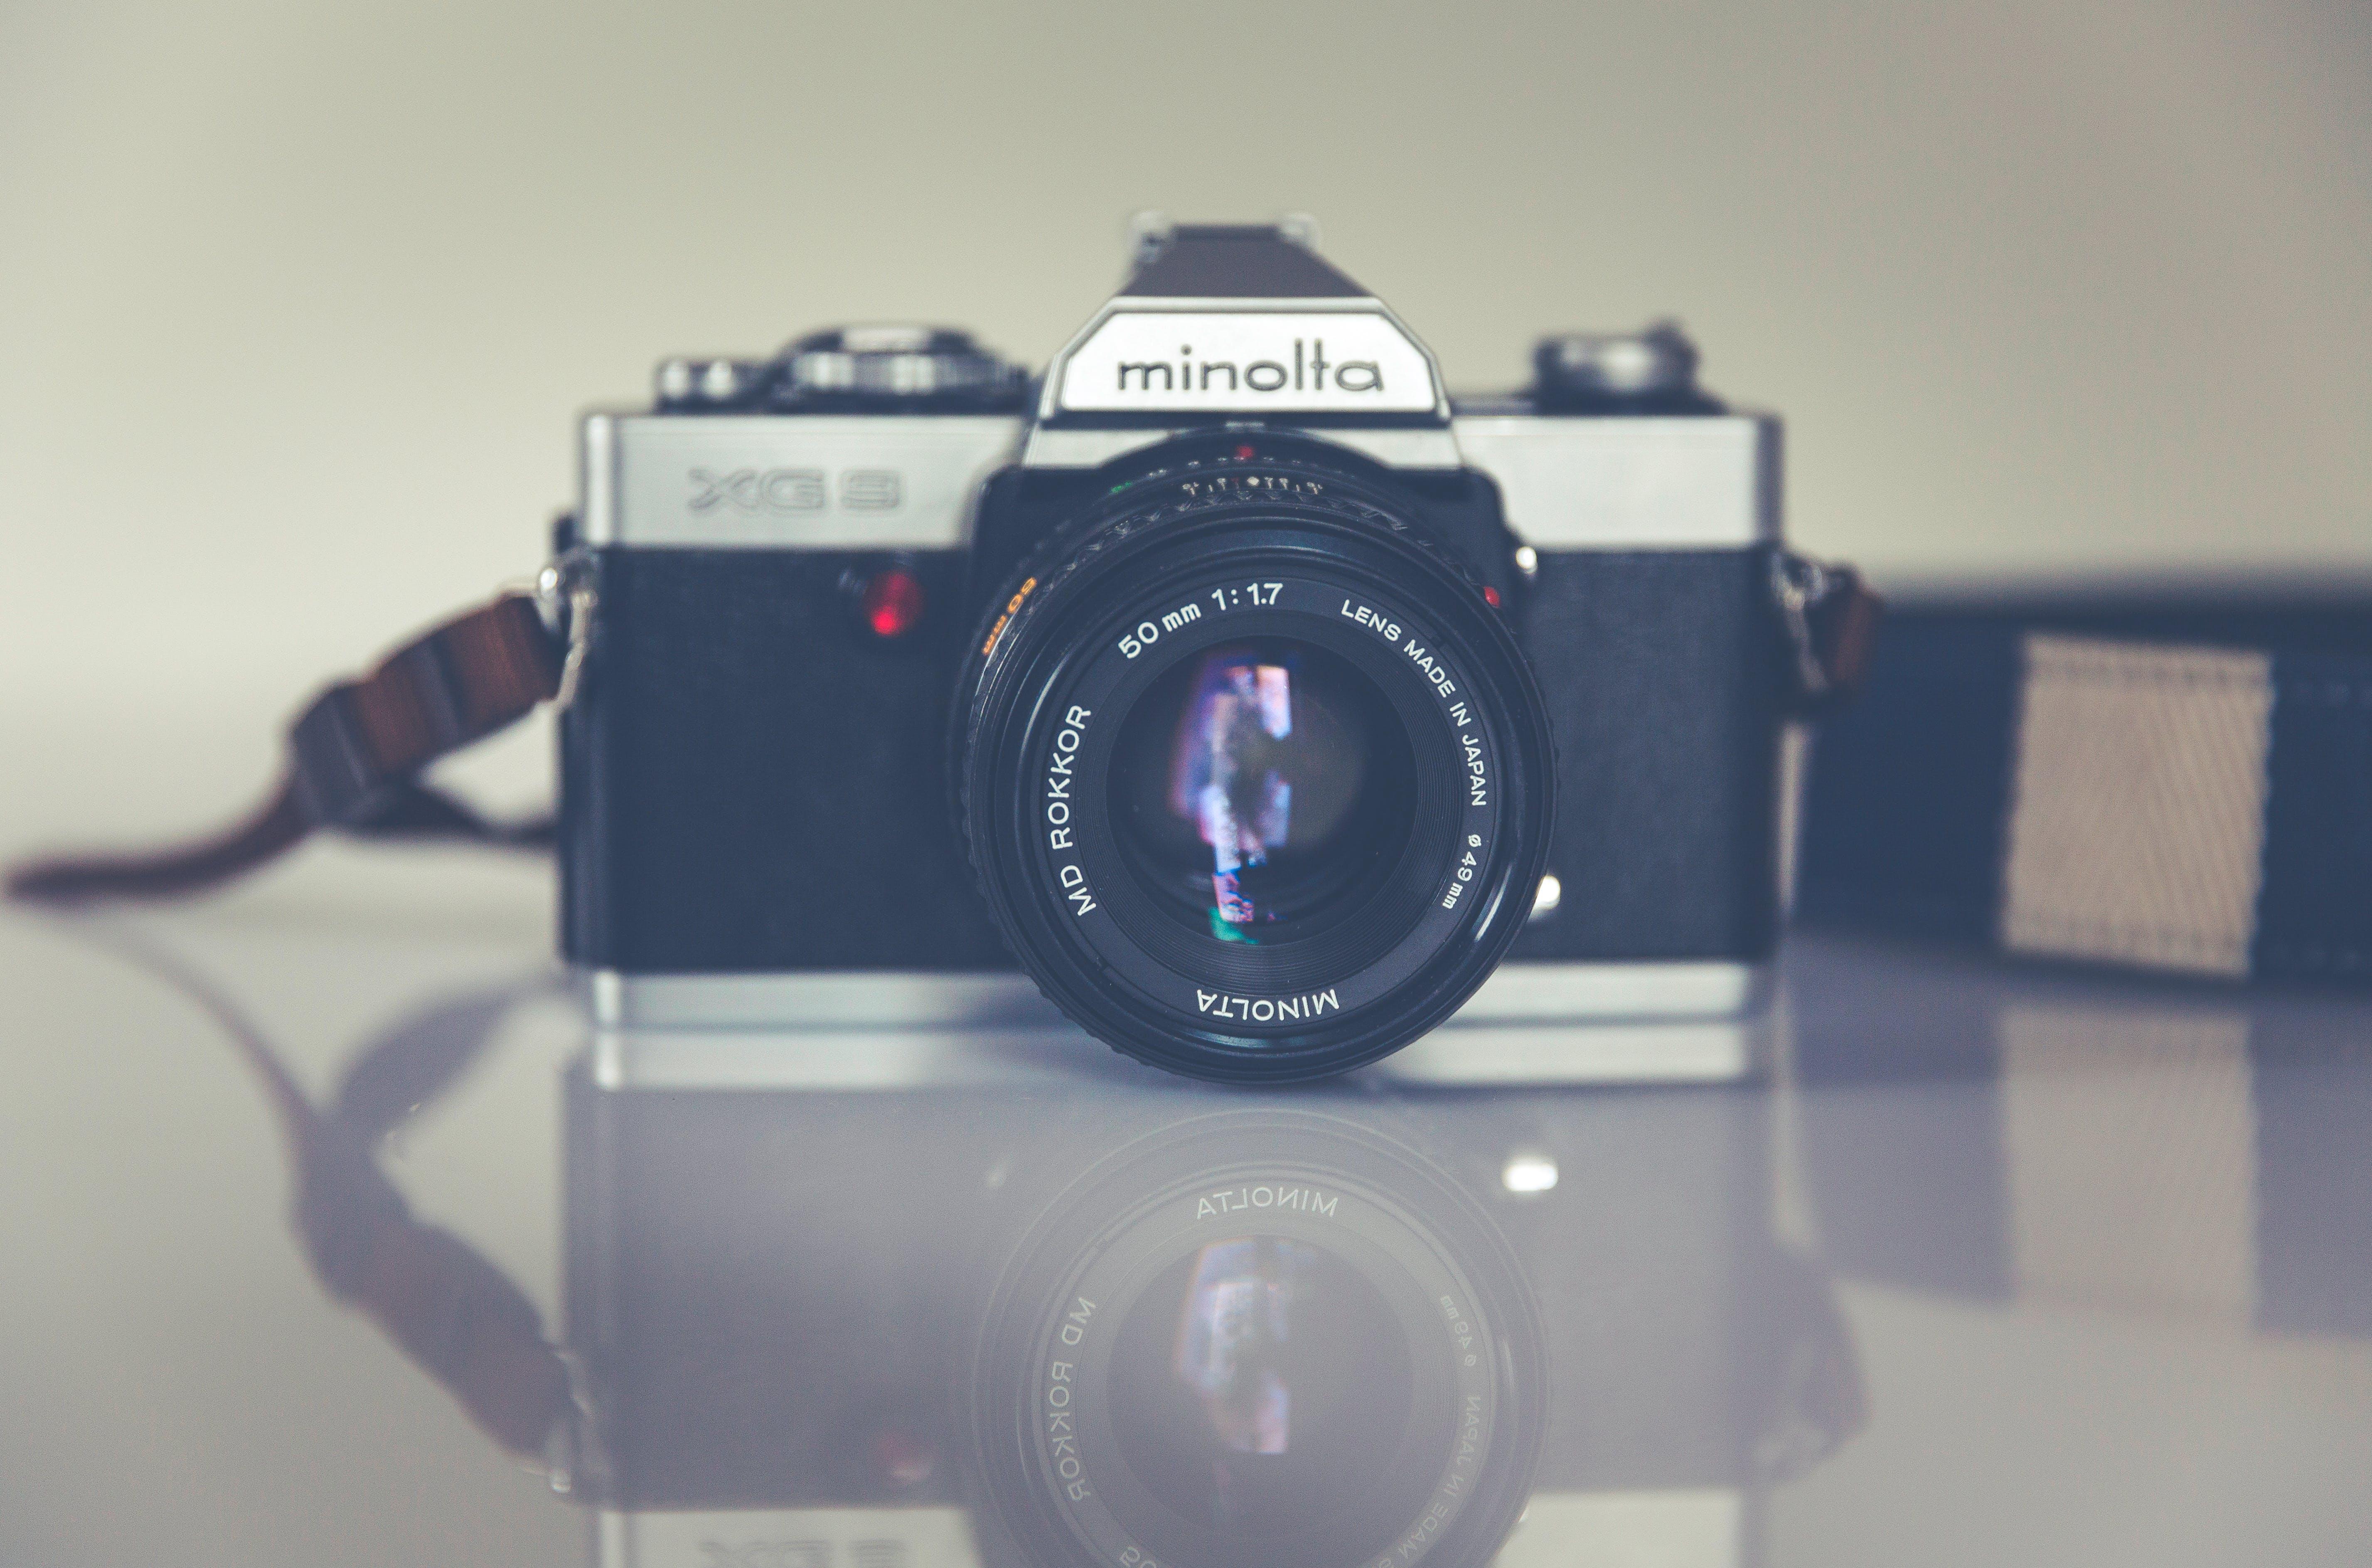 Panorama Photography of Black and Grey Minolta Camera